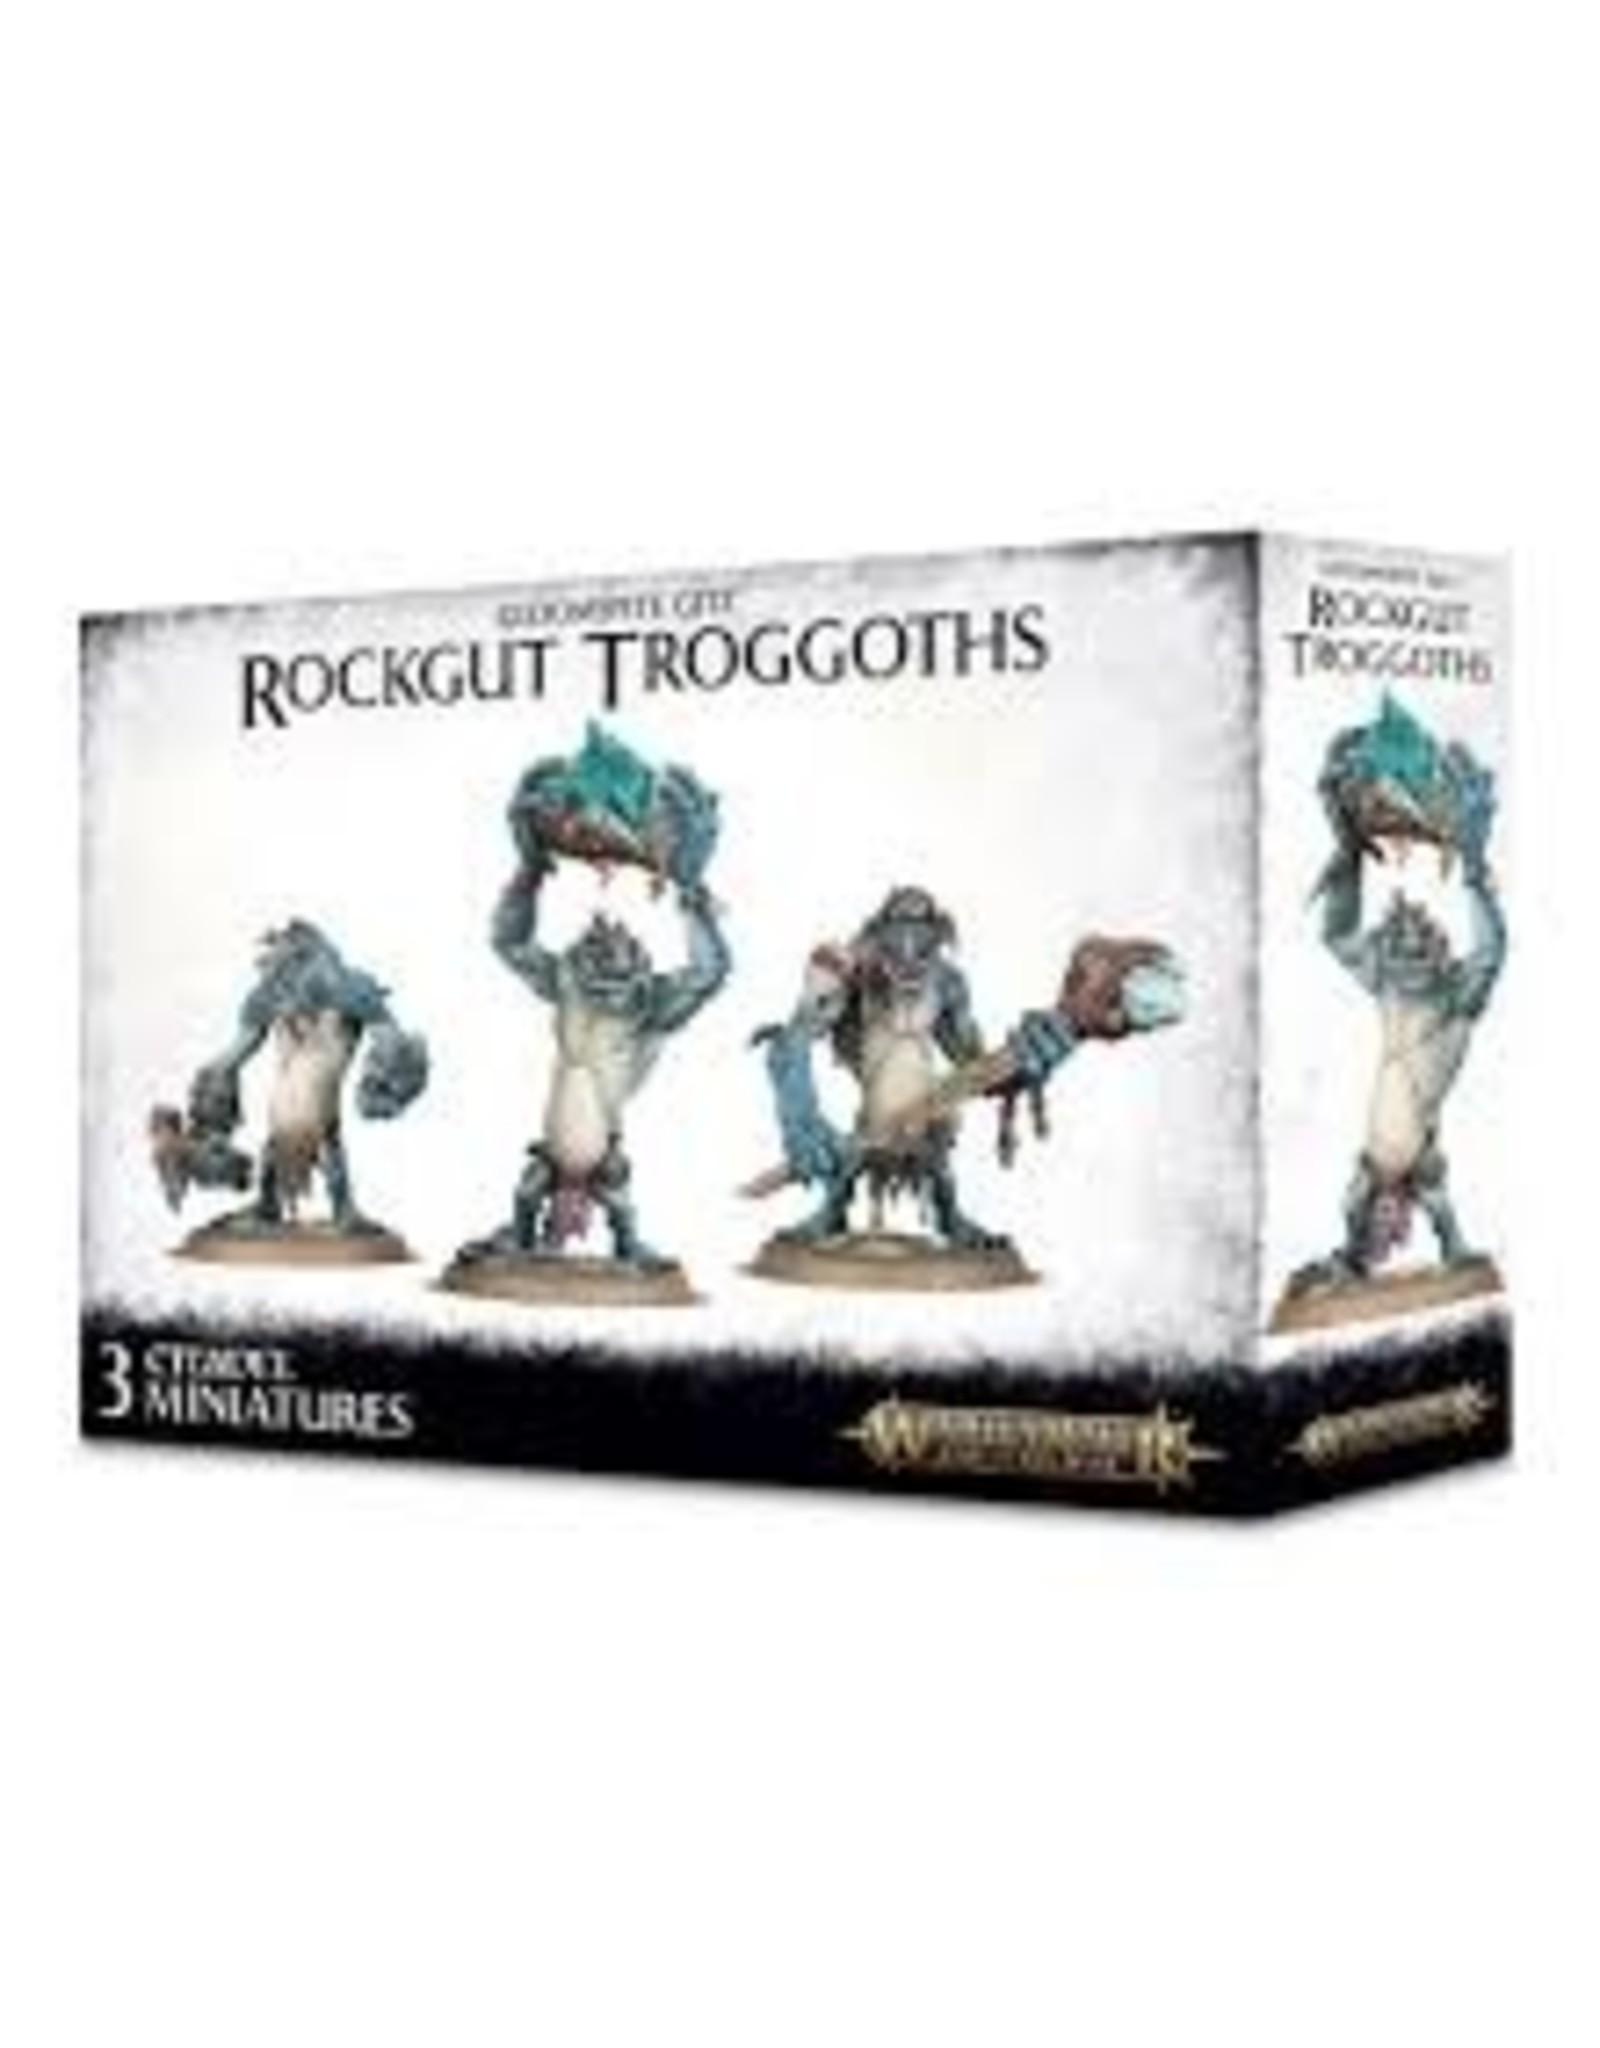 Age of Sigmar Gloomspite Gitz: Rockgut Troggoths